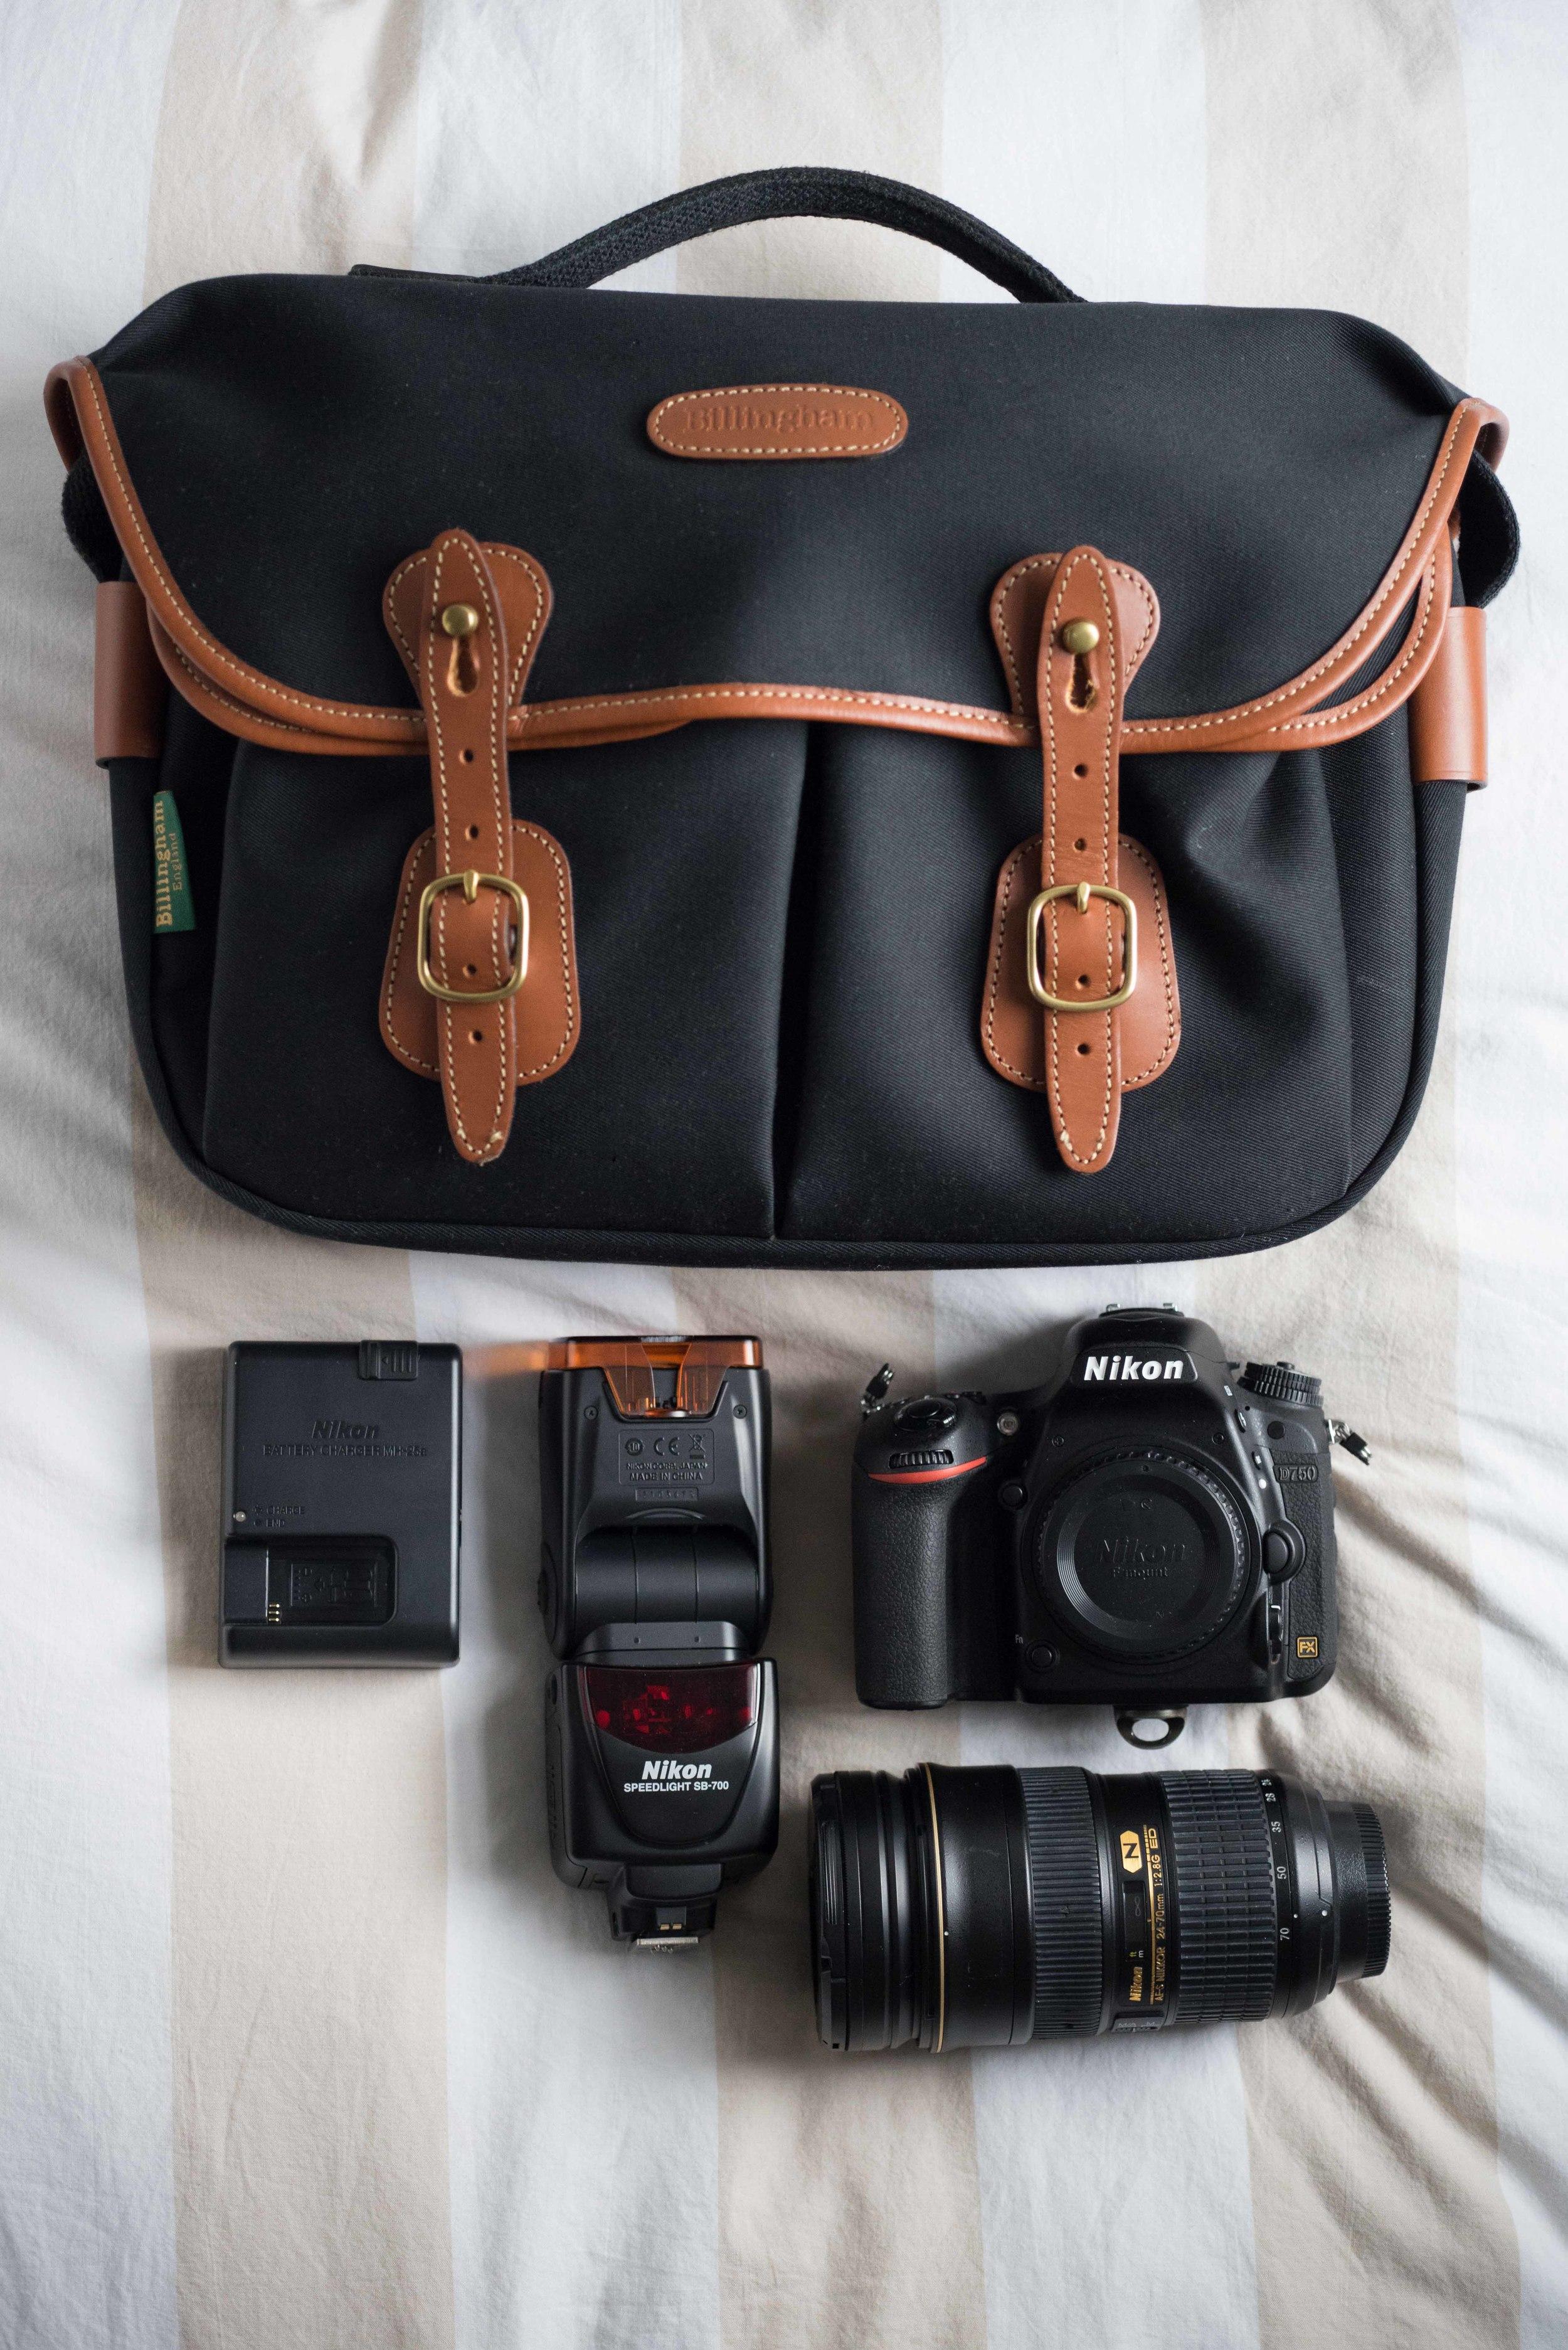 camerabags-7.jpg